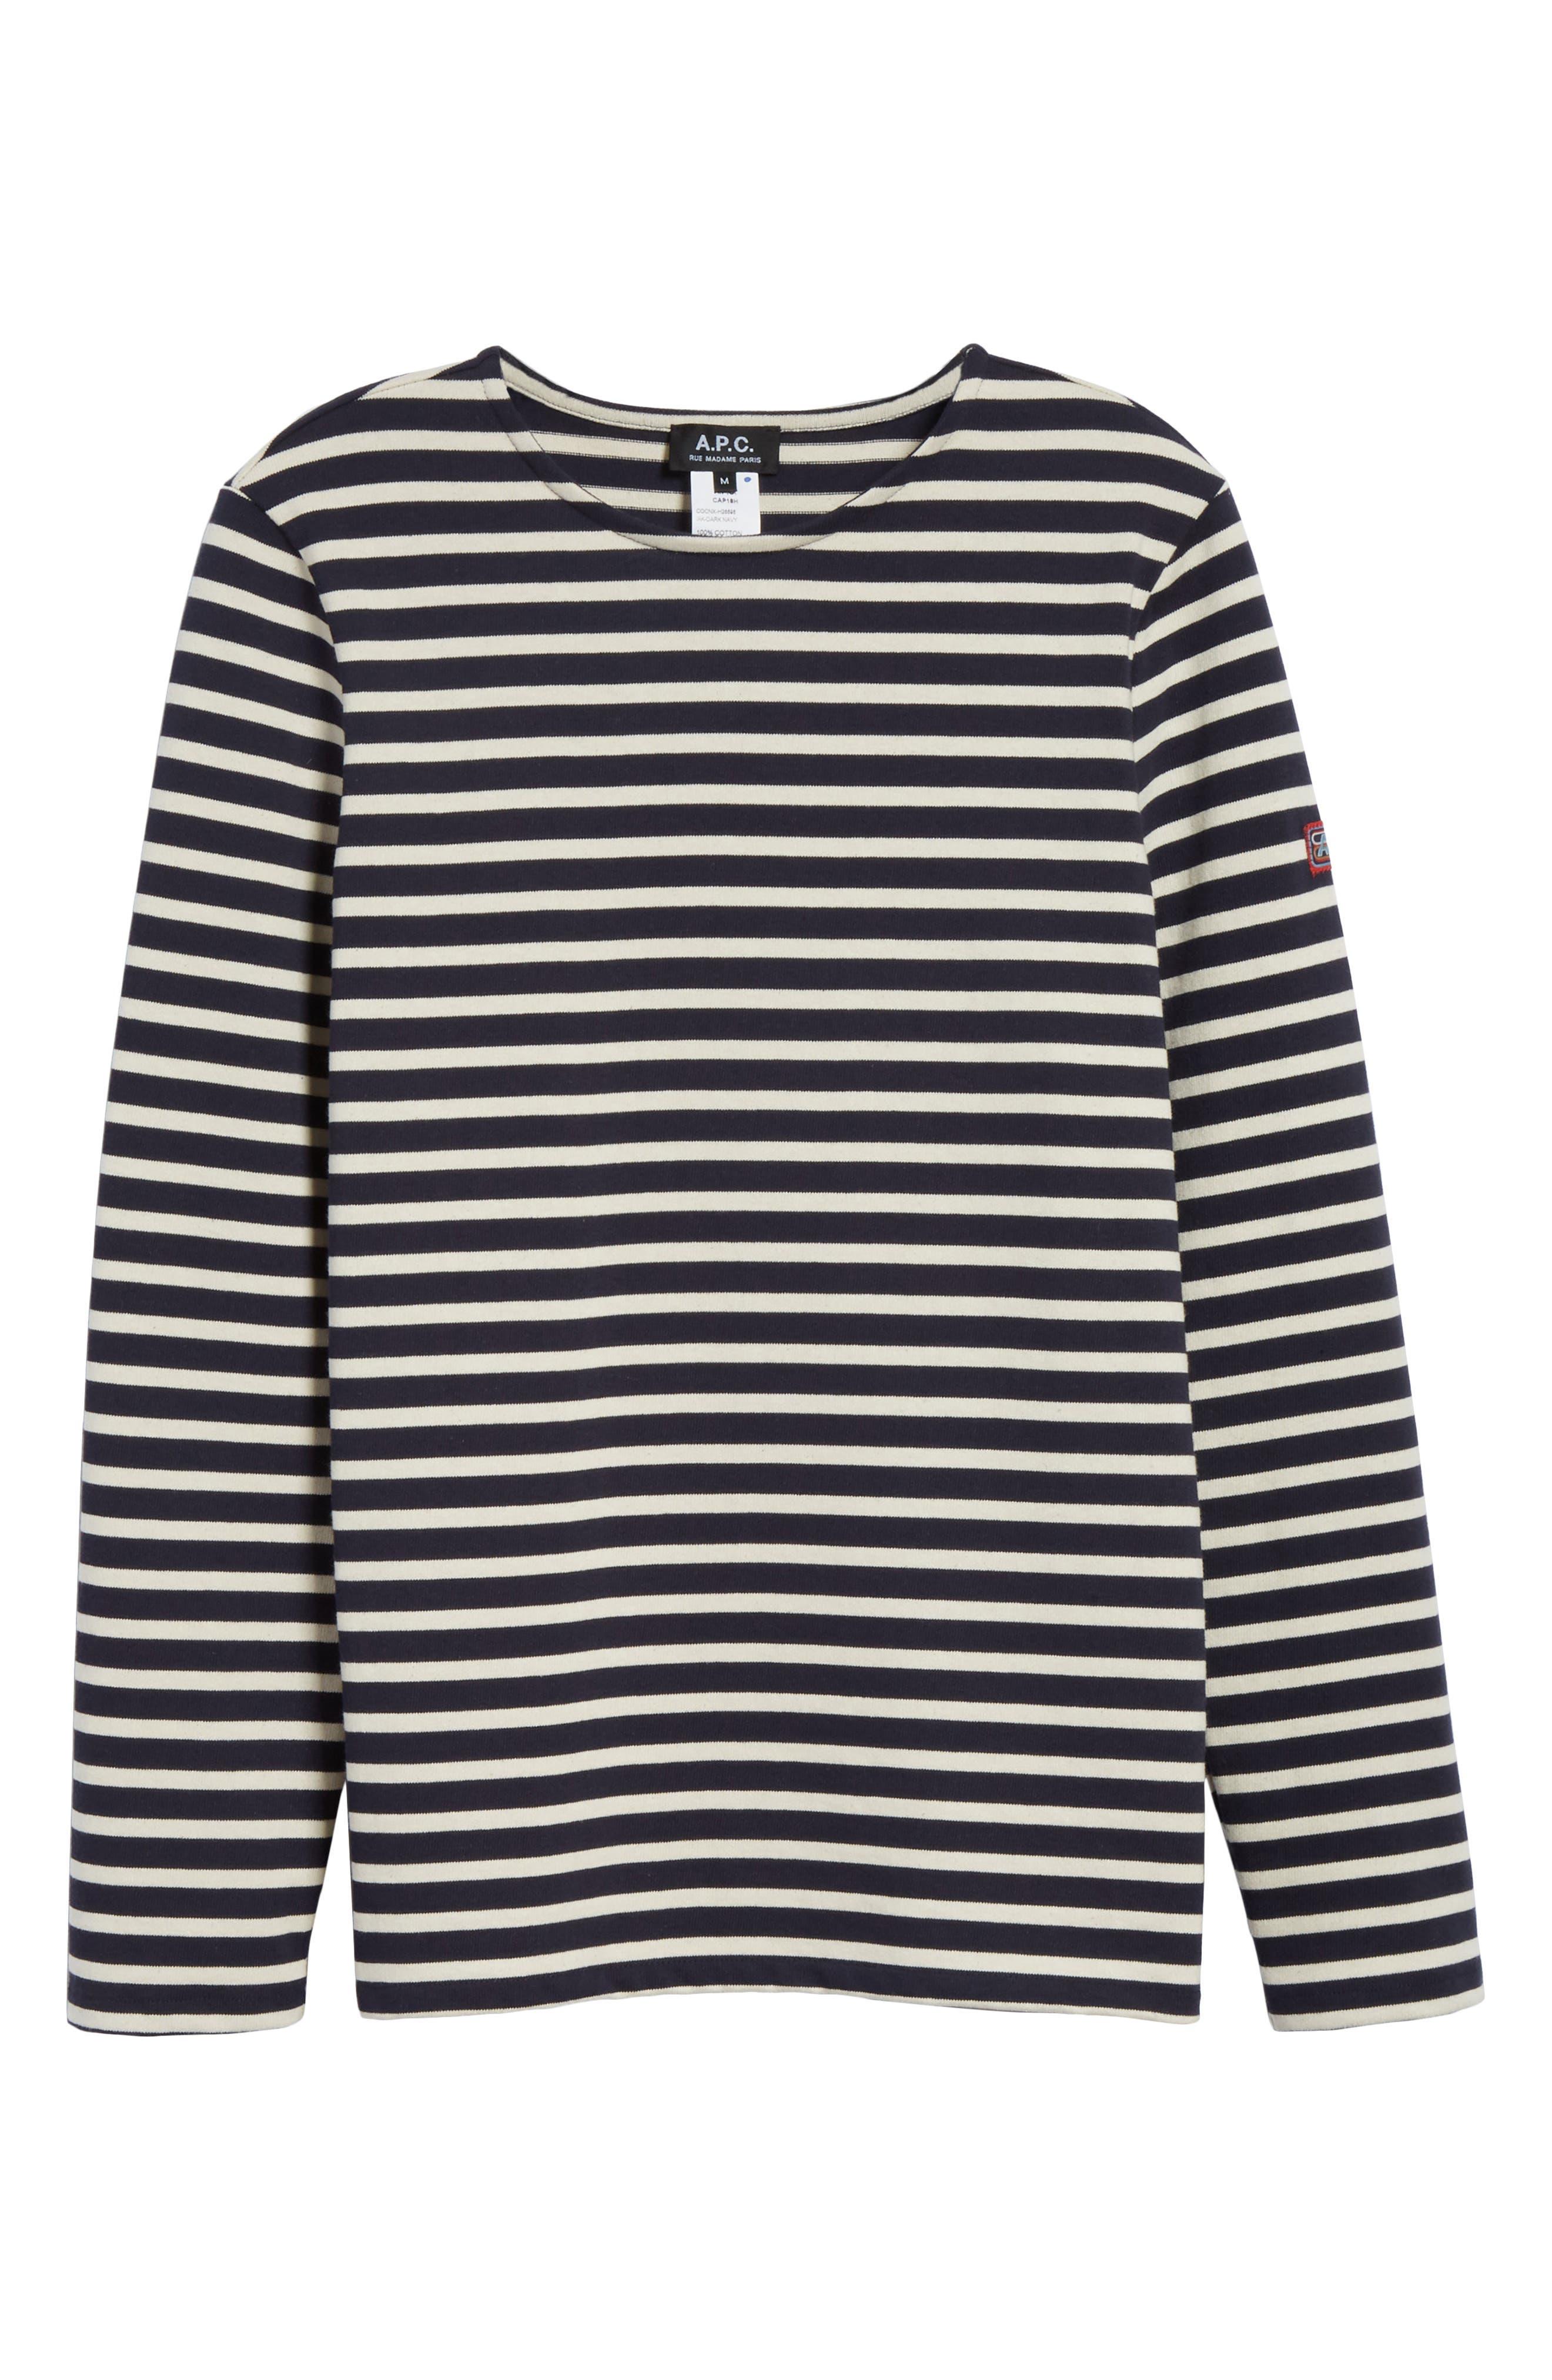 Marinière Matt Stripe Long Sleeve T-Shirt,                             Alternate thumbnail 6, color,                             DARK NAVY